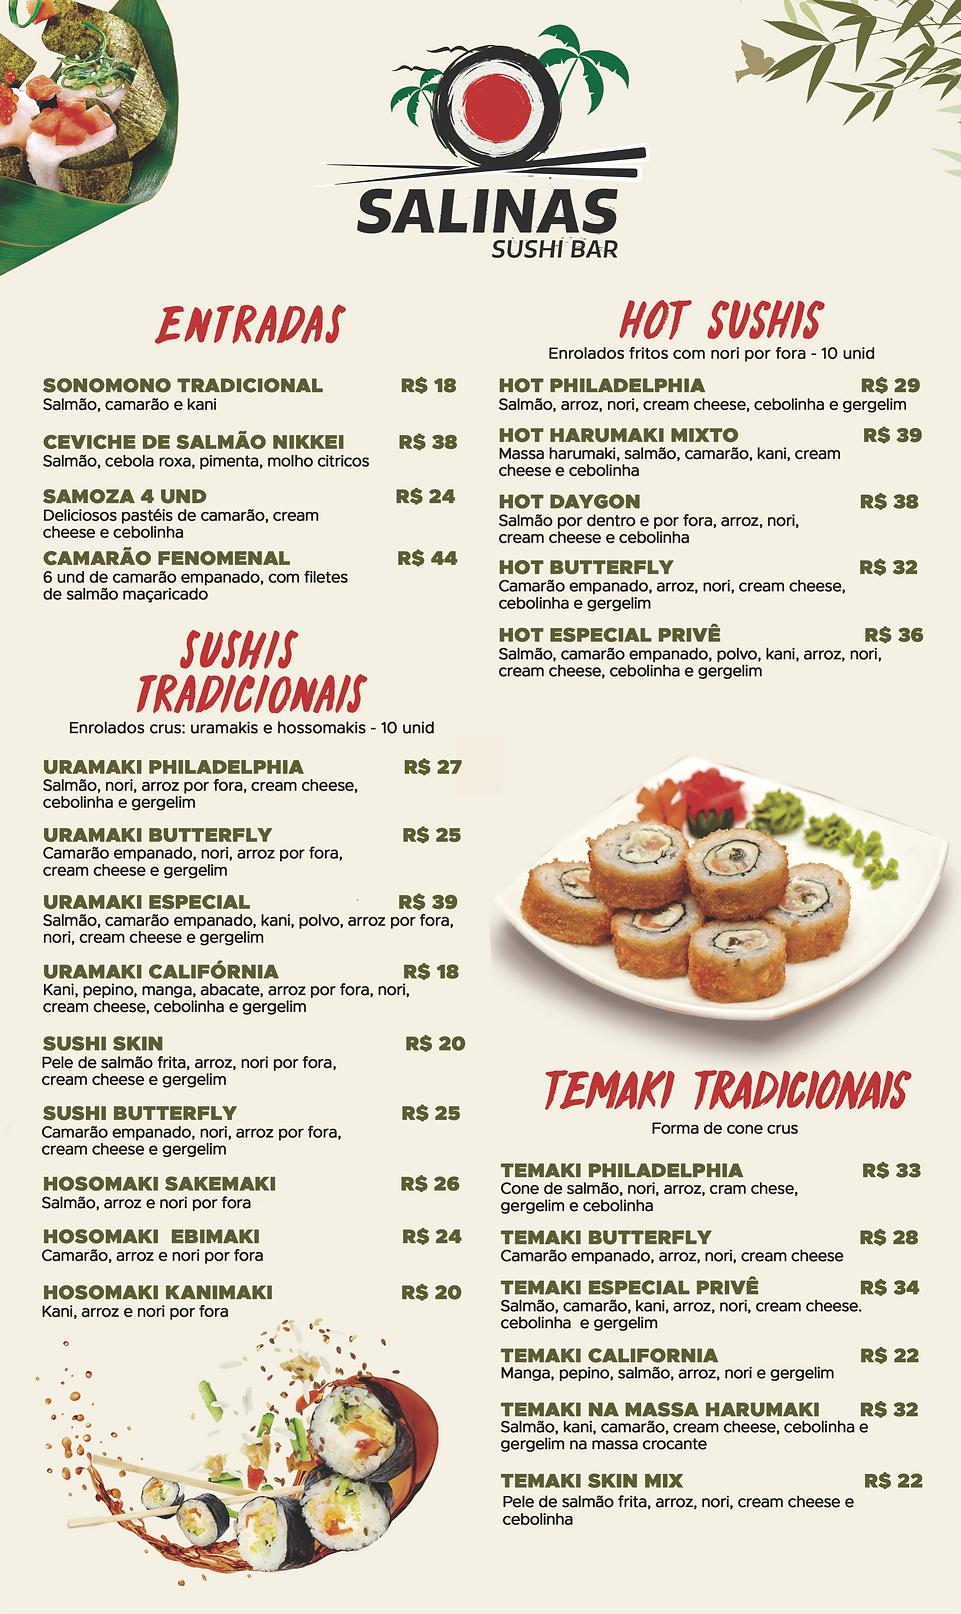 salinas sushi 1.png